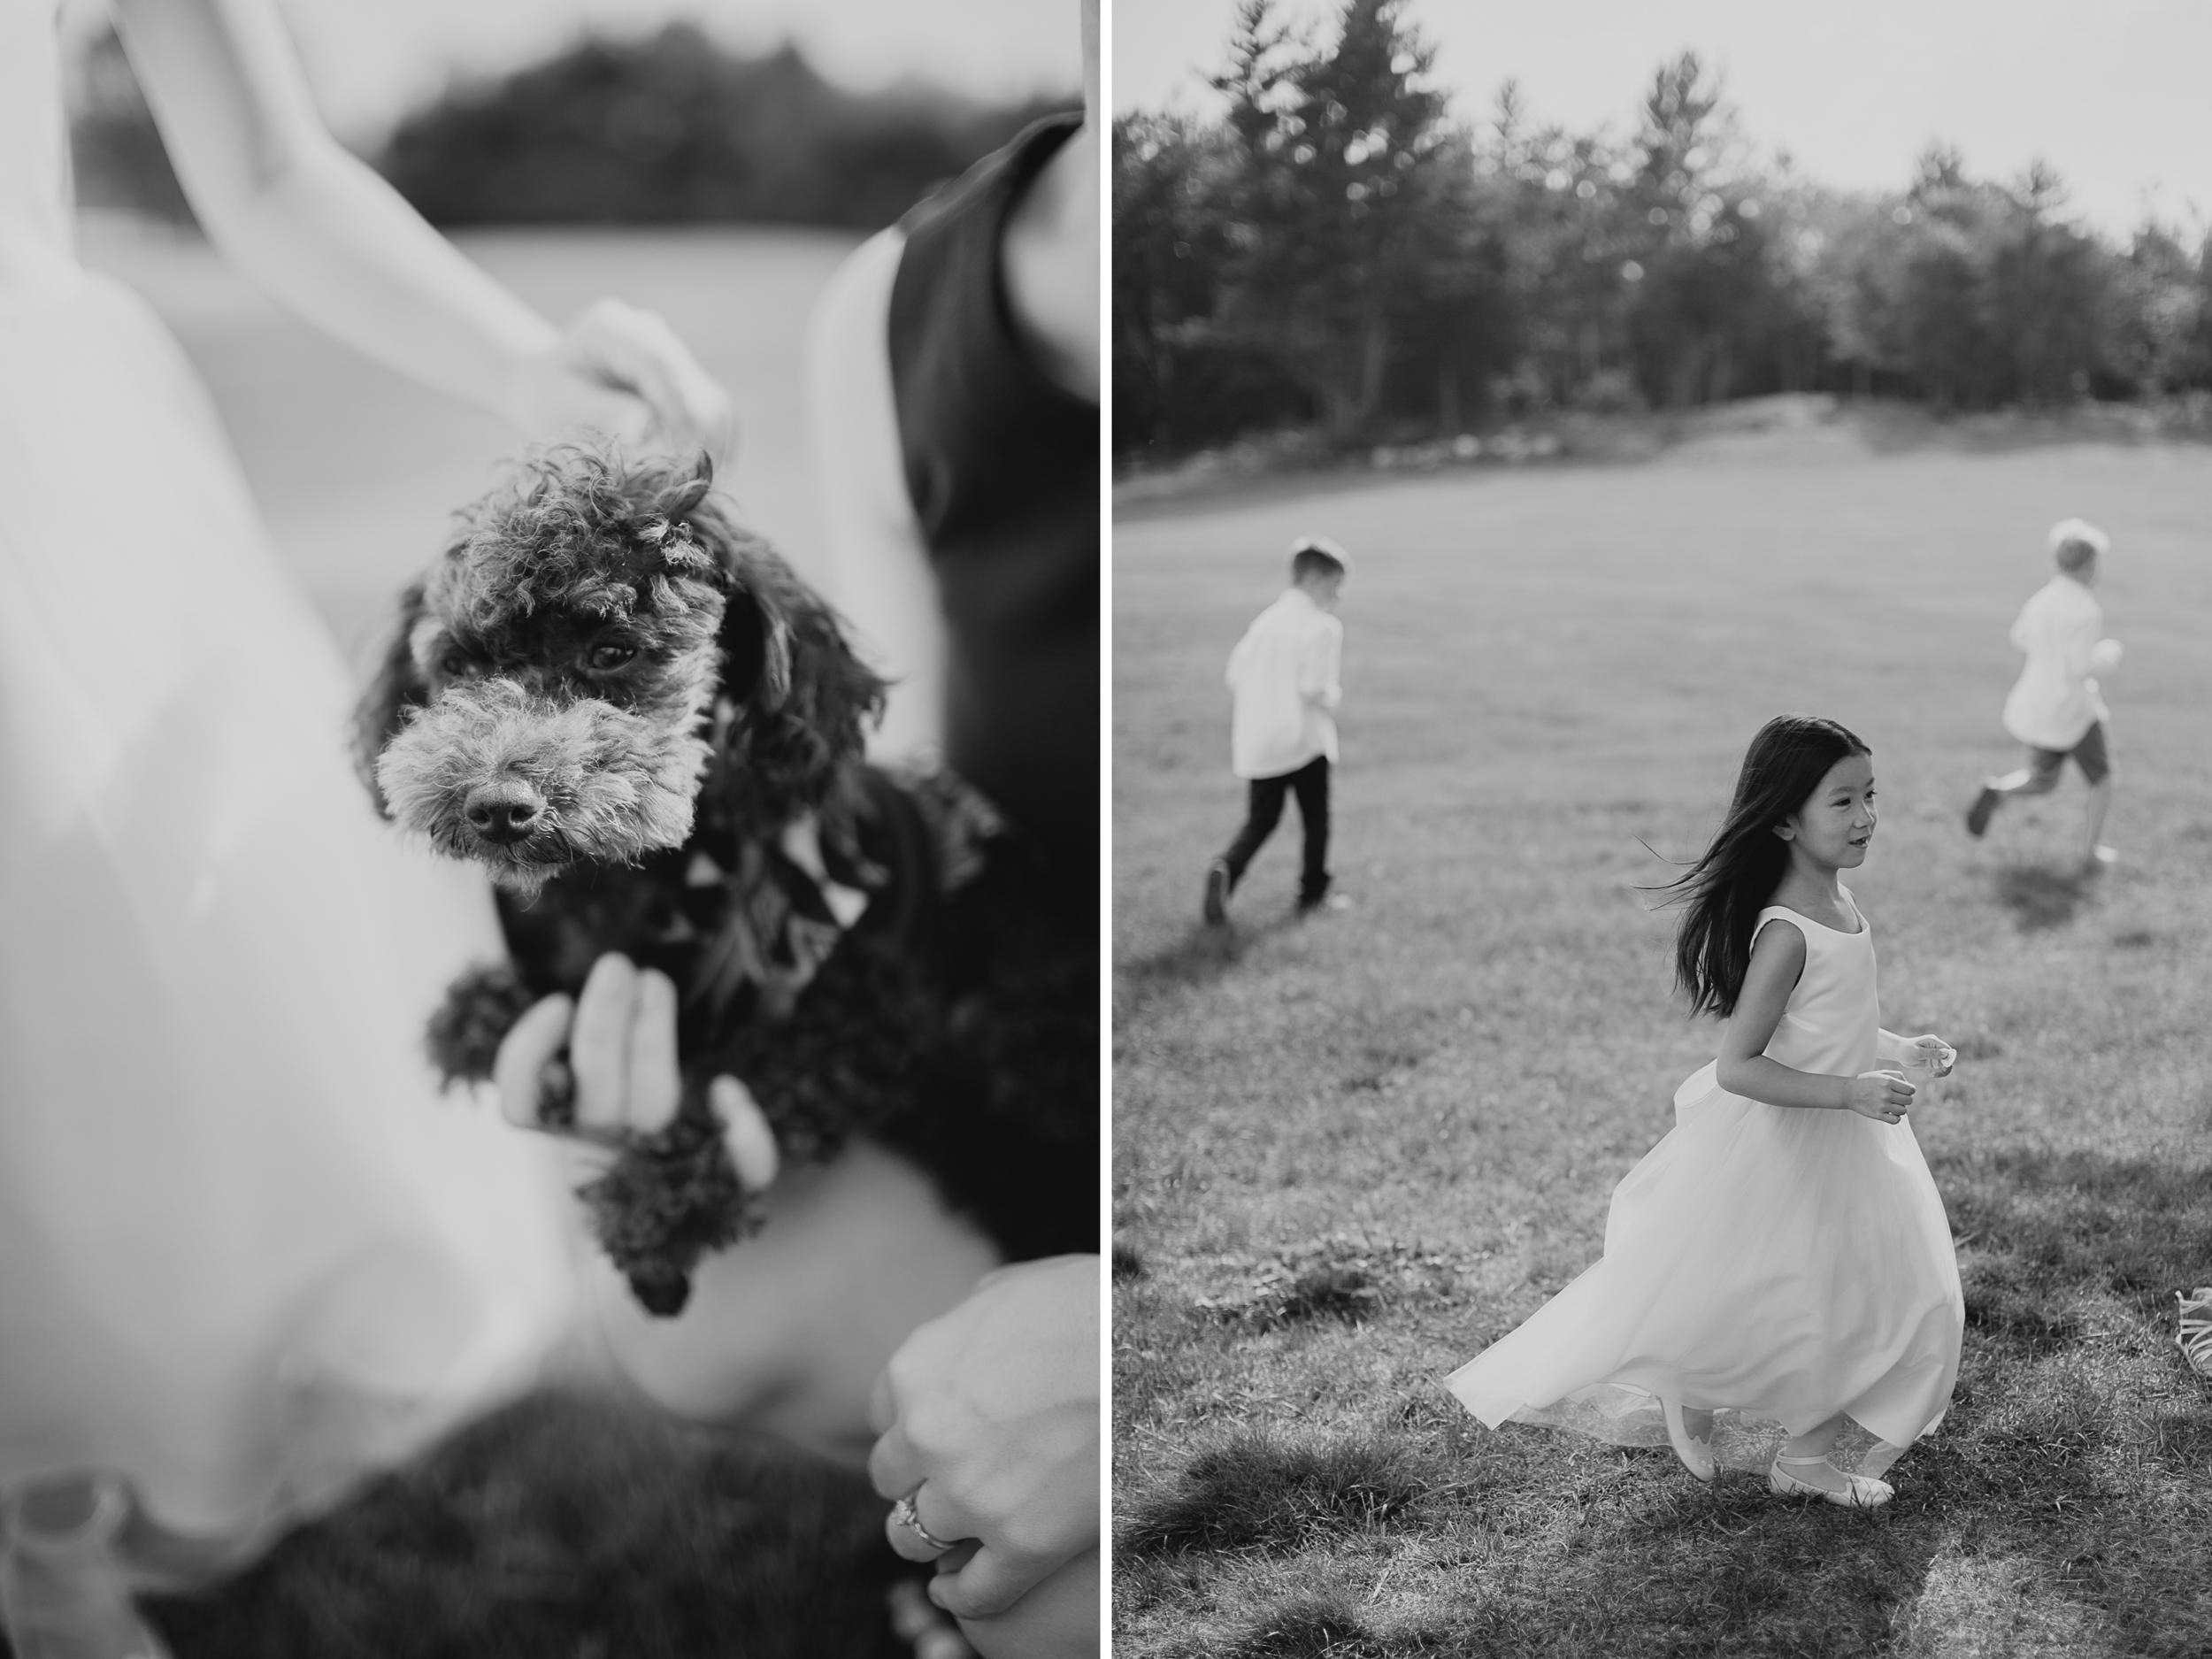 william_allen_farm_wedding_pownal_maine_ilkatayler-26.jpg